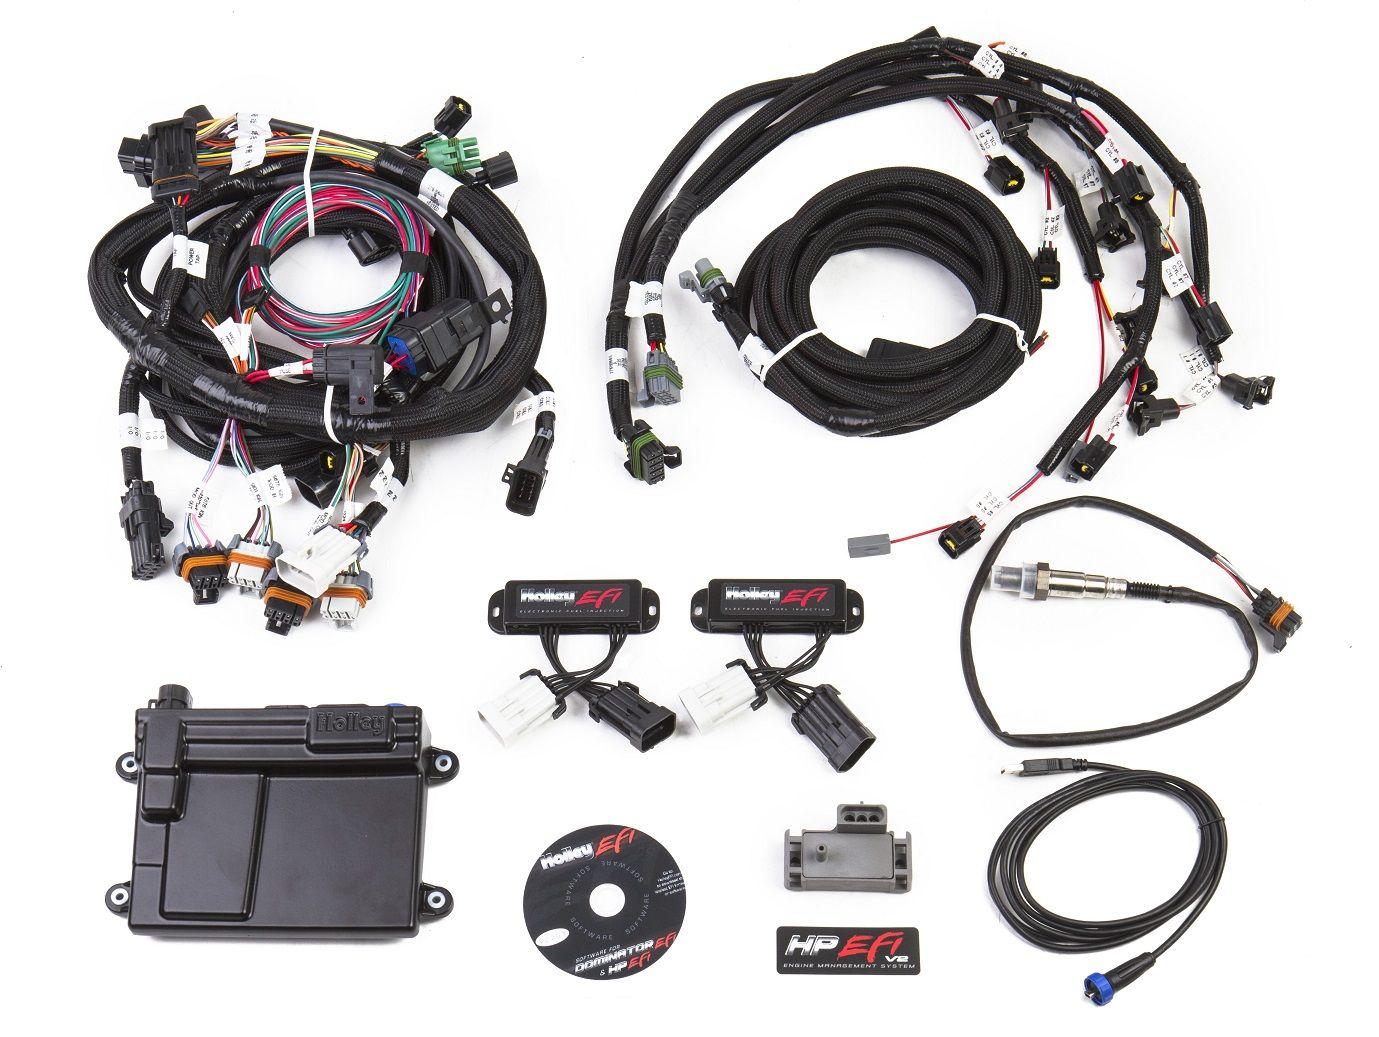 550 616n hp efi ecu harness kits [ 1379 x 1037 Pixel ]